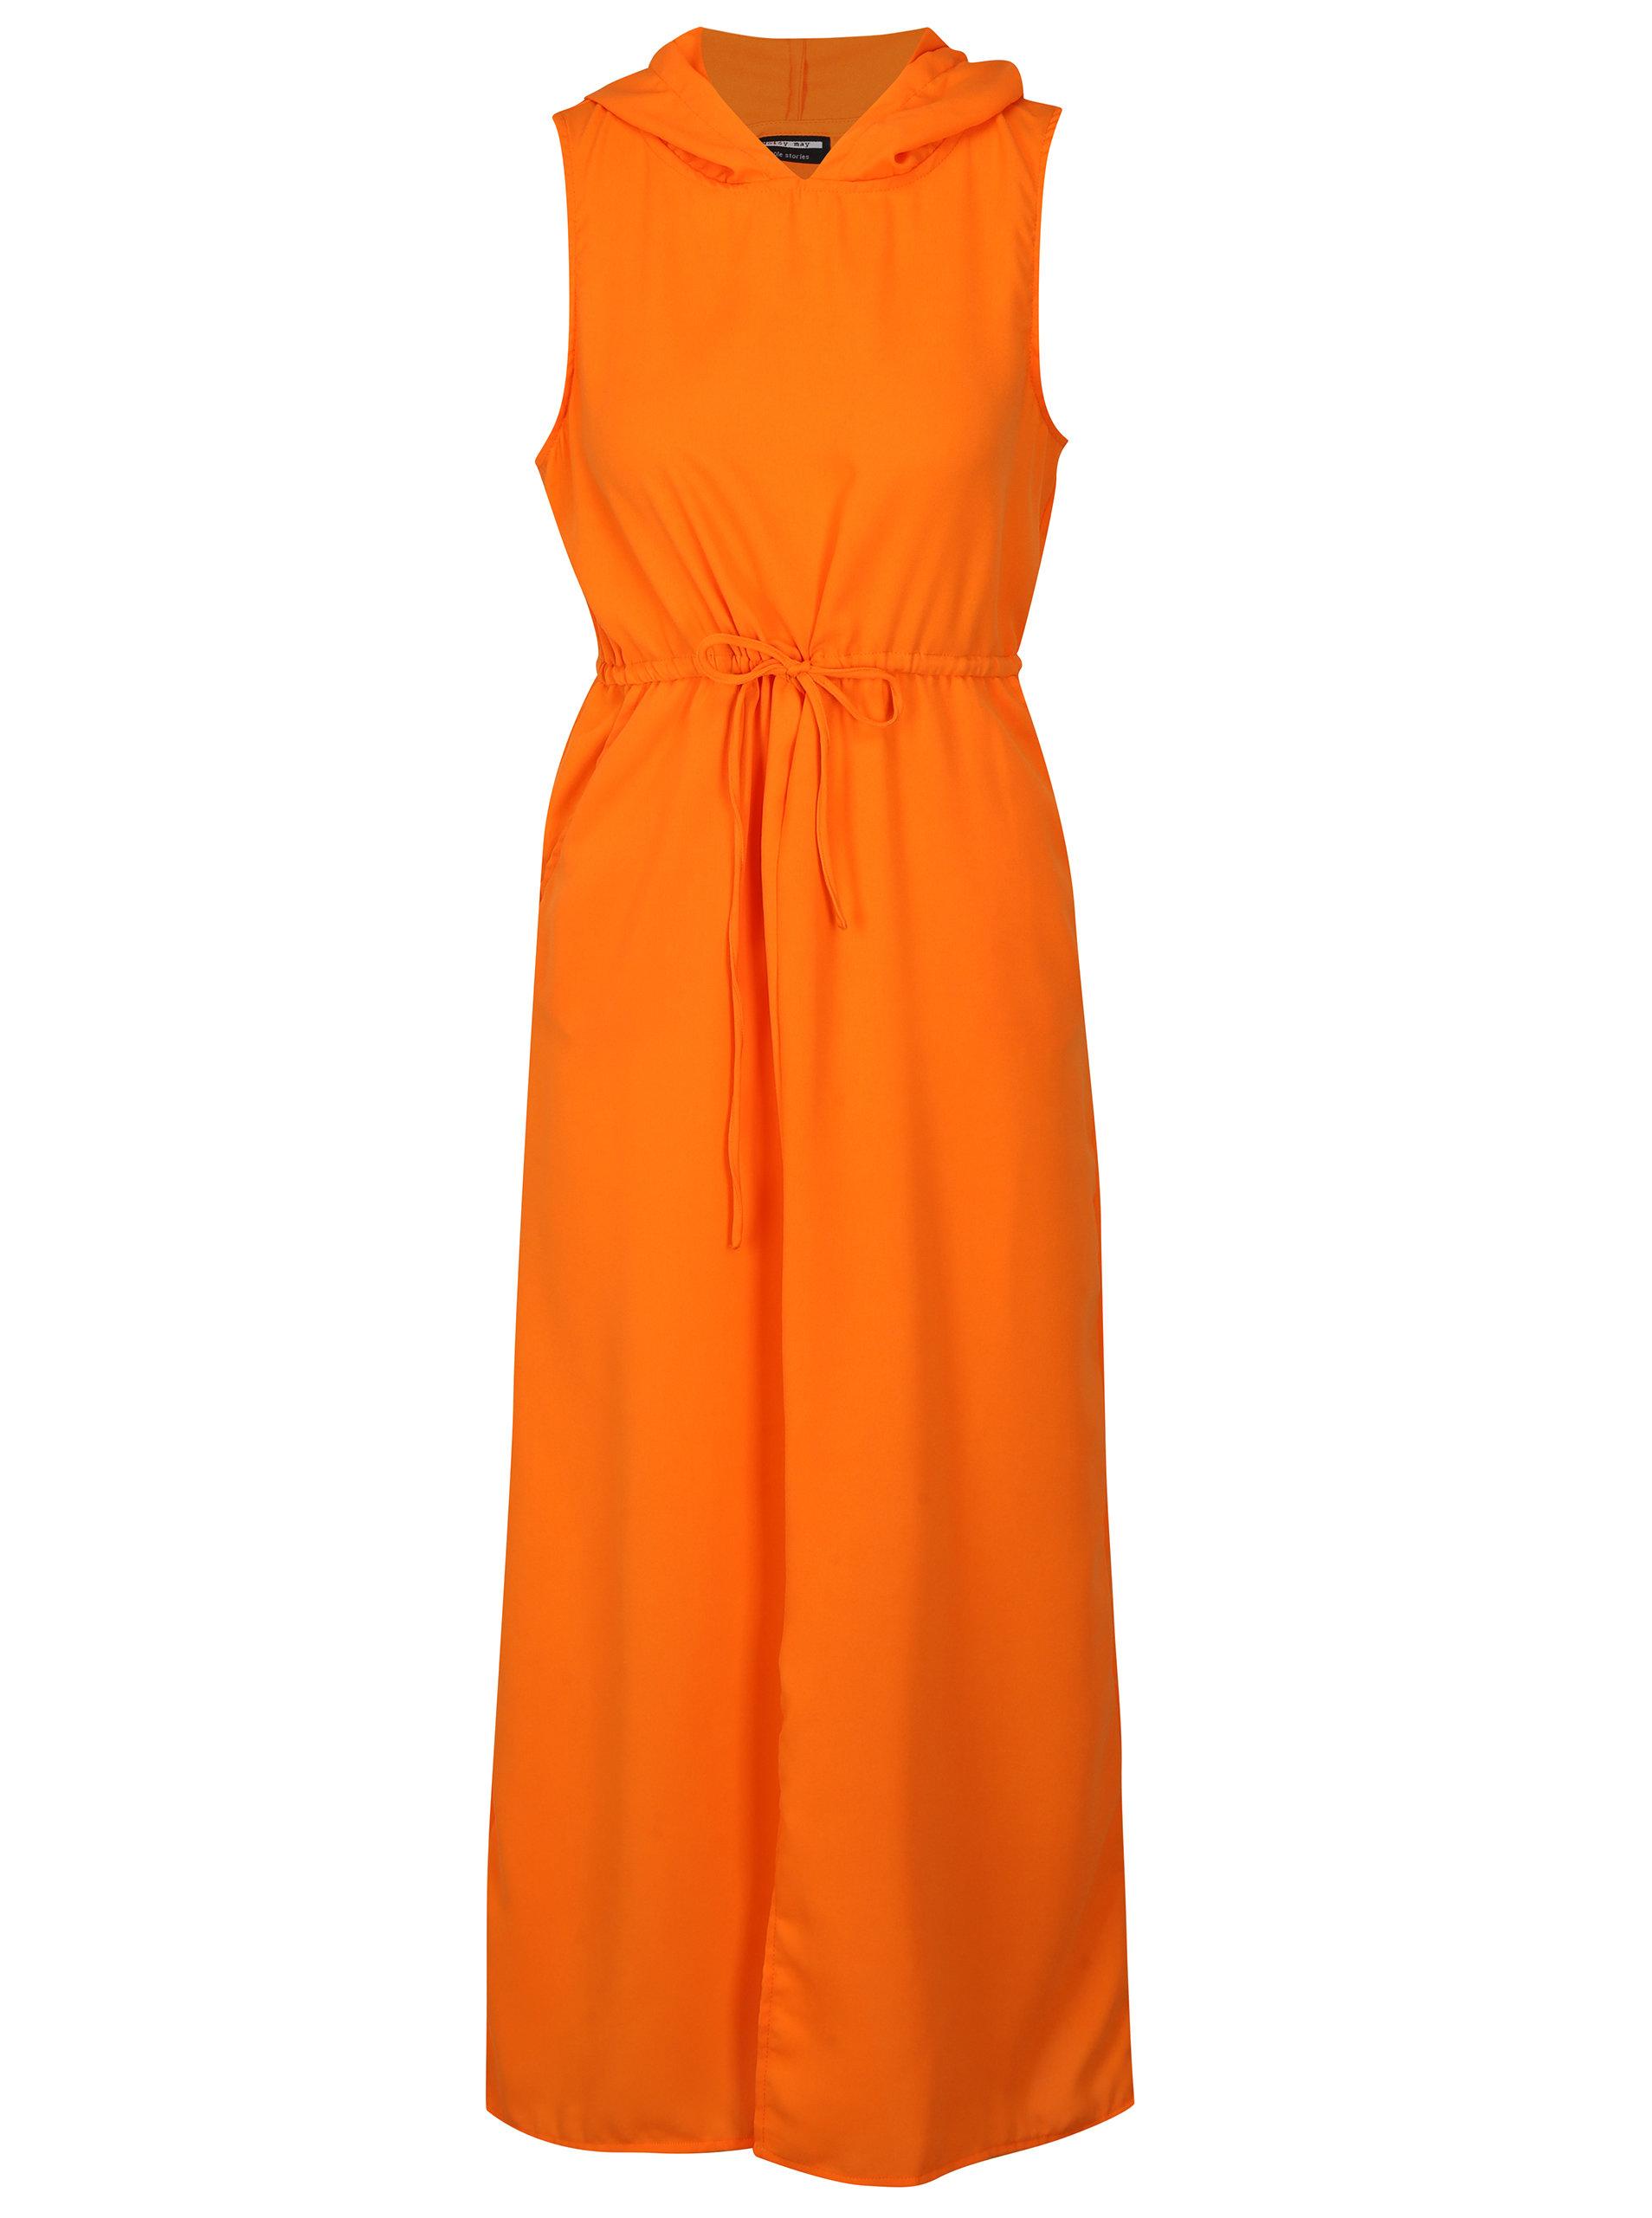 Oranžové maxišaty s kapucňou Noisy May Josephine ... b5d1e49b2aa